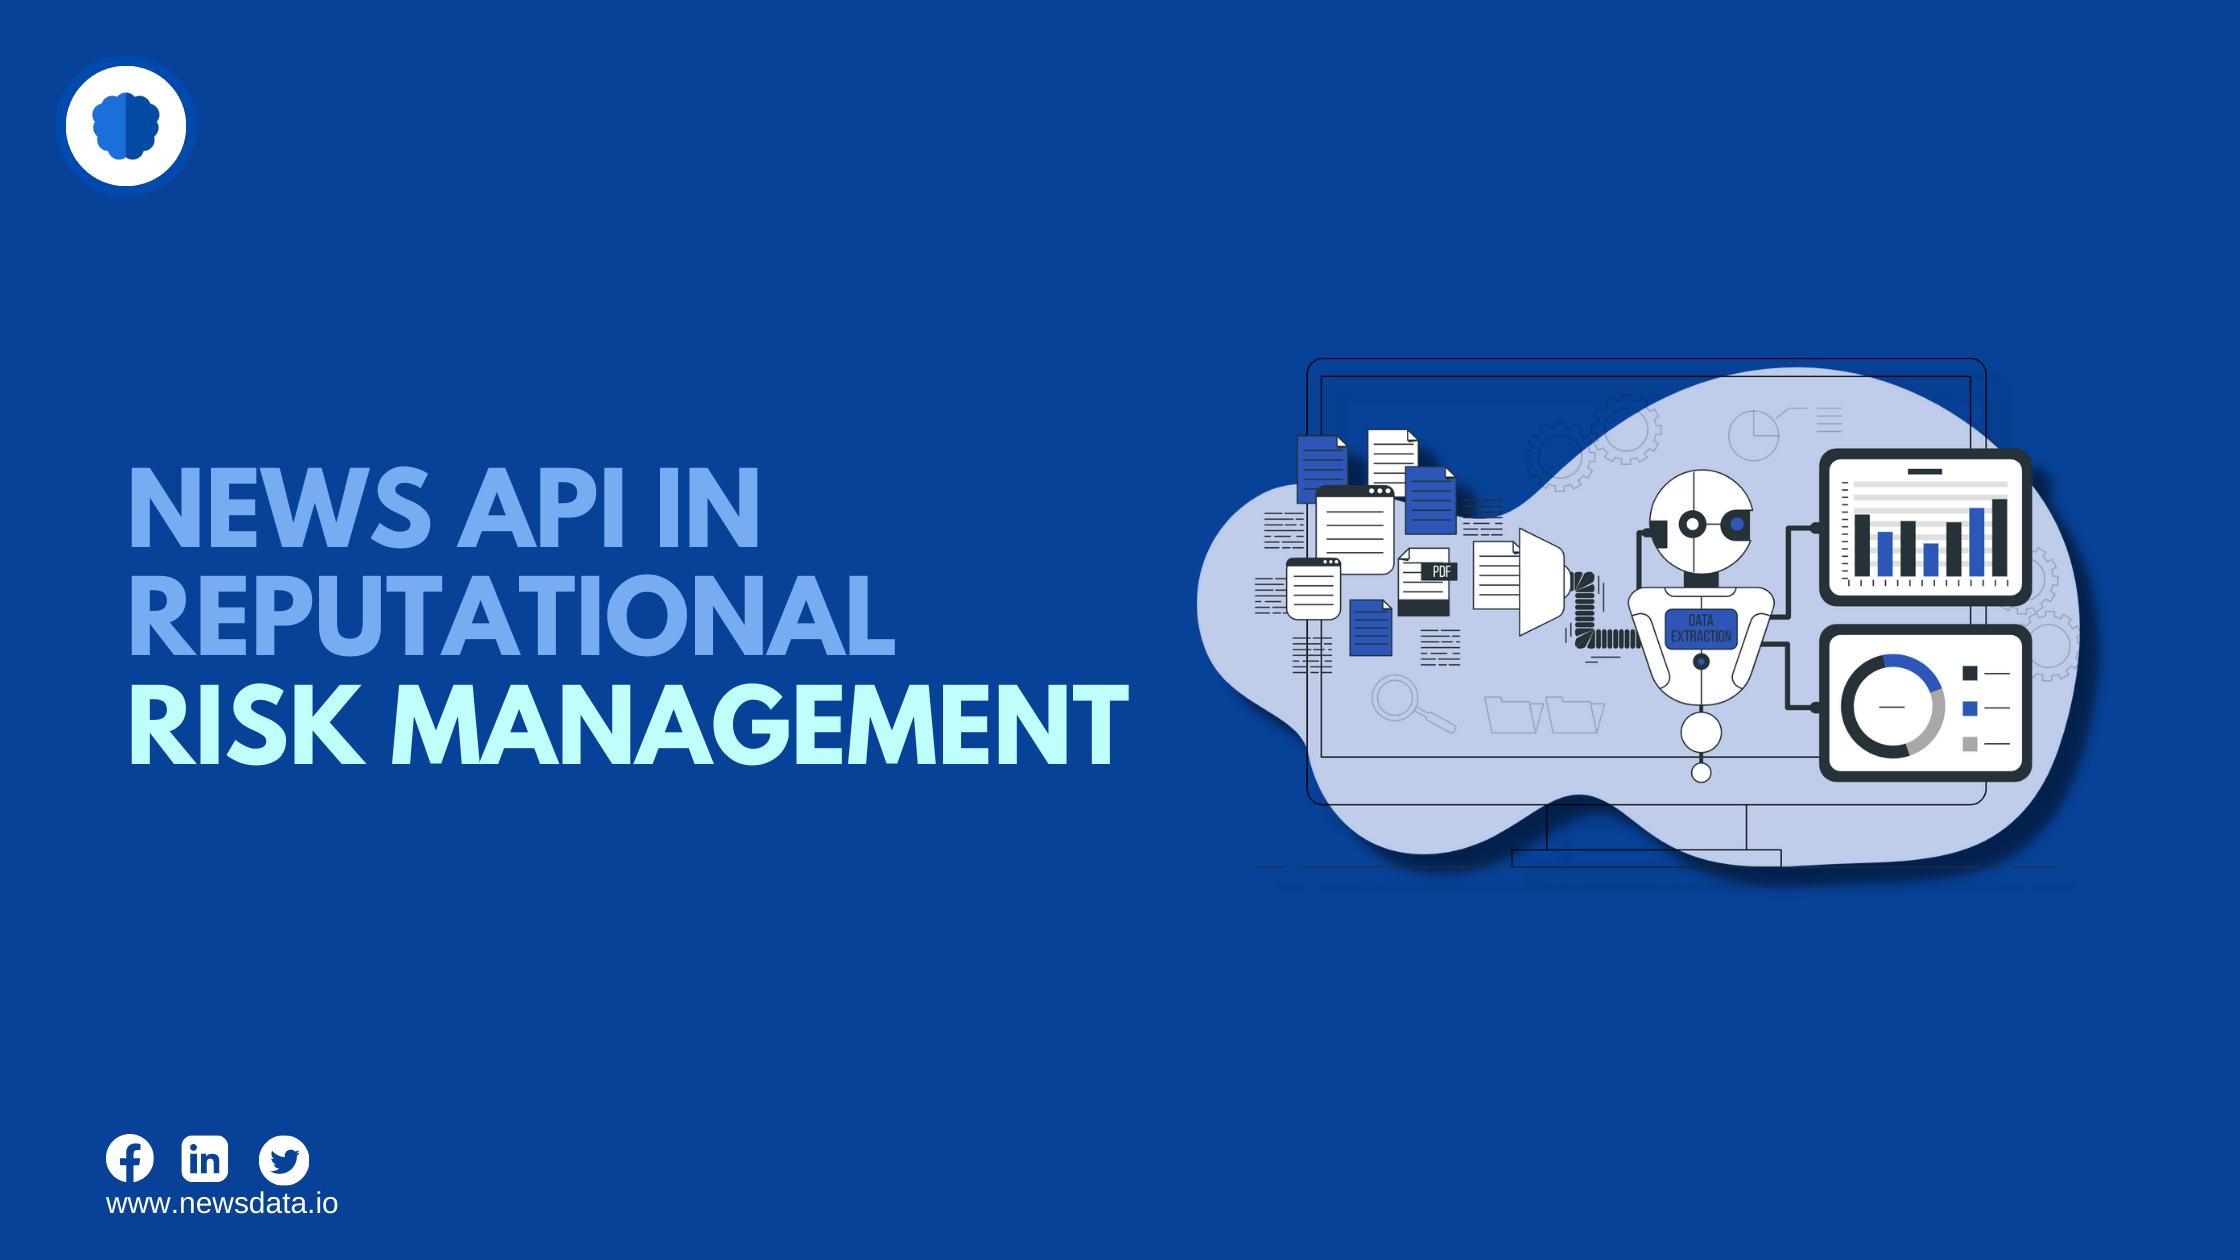 news api in reputational risk management